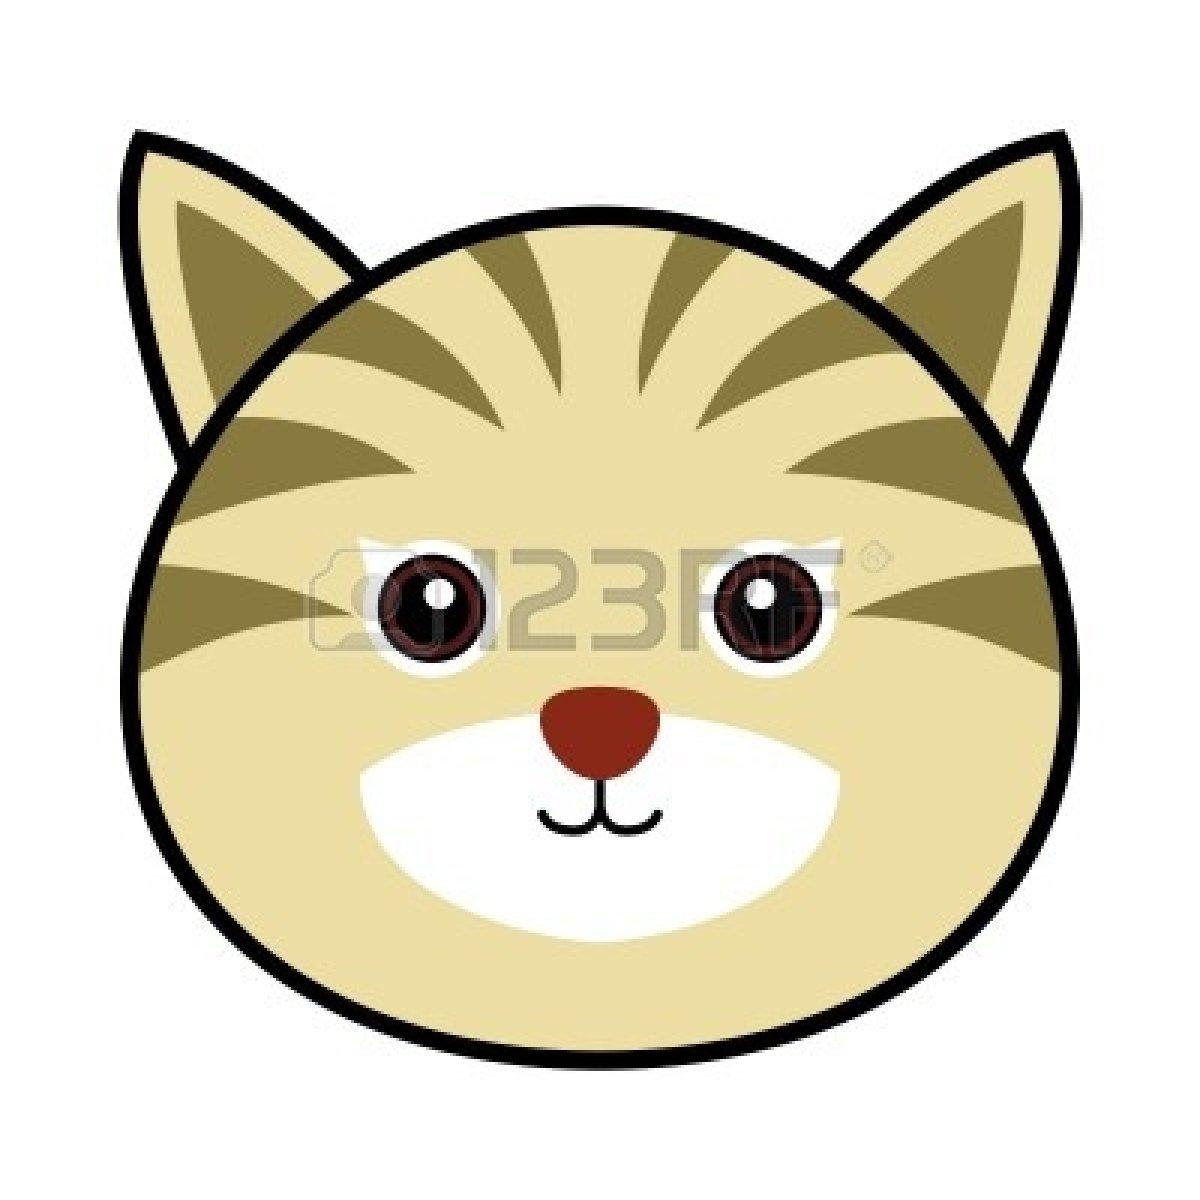 1200x1200 Clipart Cat Face